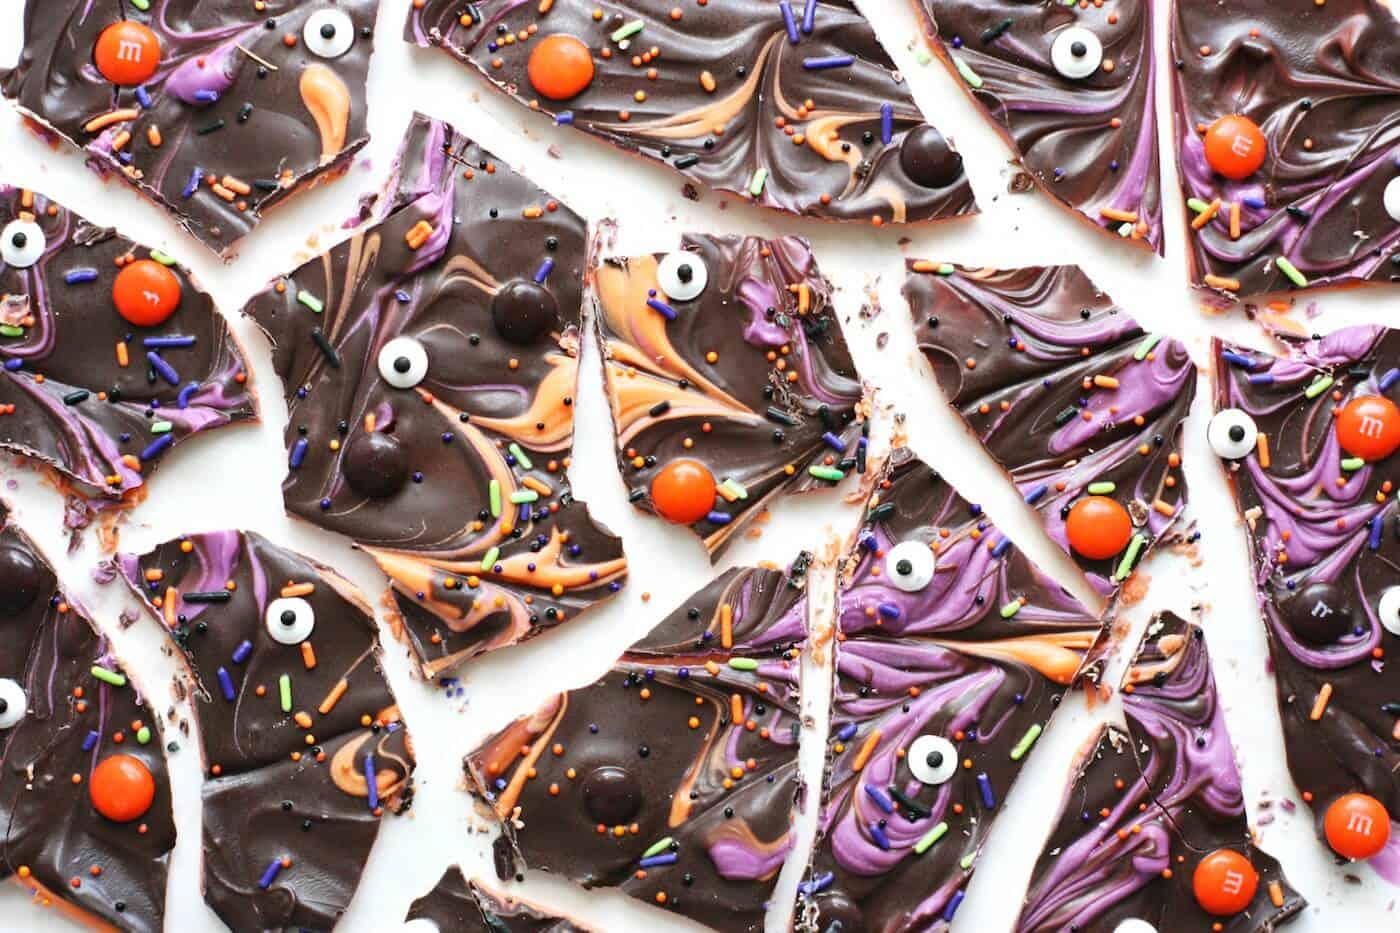 Deliciously Spooky Layered Halloween Bark